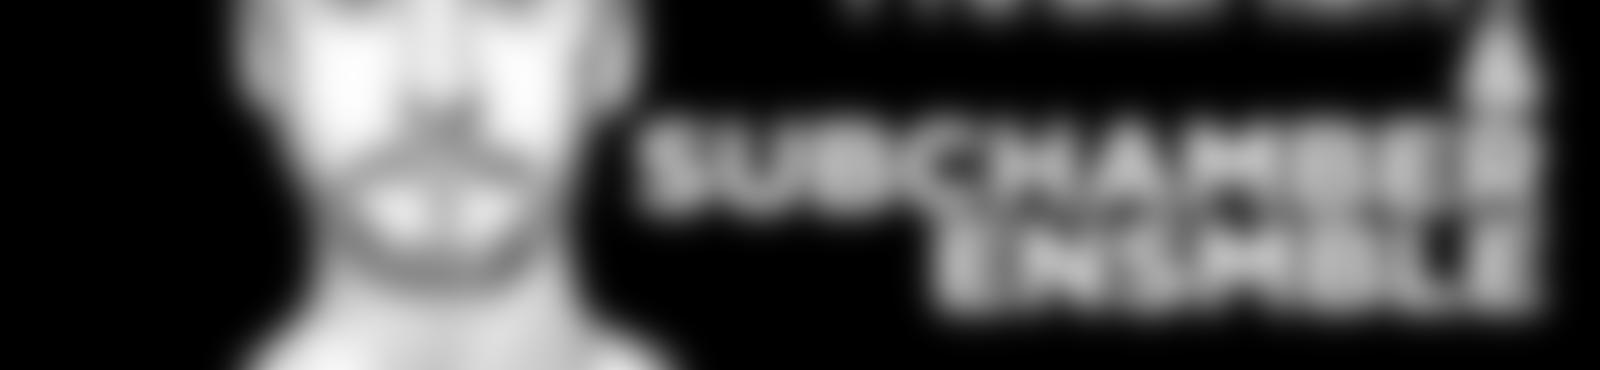 Blurred 9b7db00e a368 437a 89ea c052875897f6